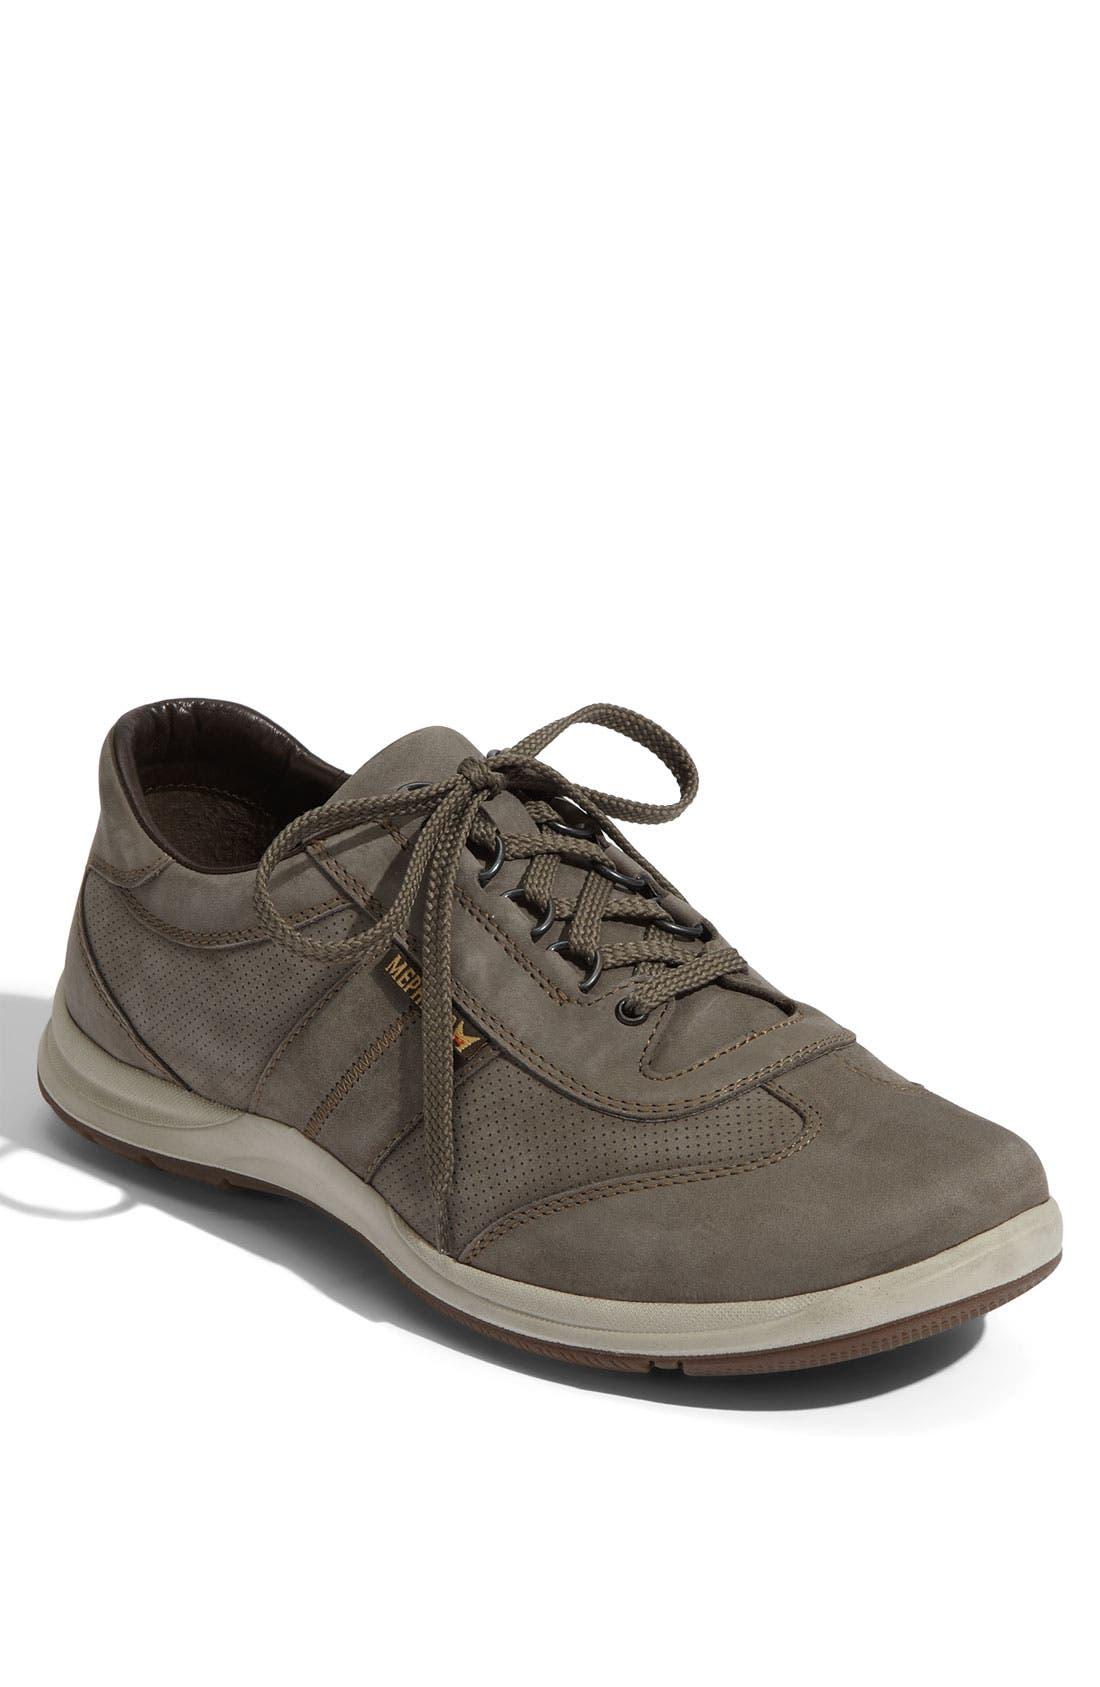 Main Image - Mephisto 'Hike' Perforated Walking Shoe (Men)